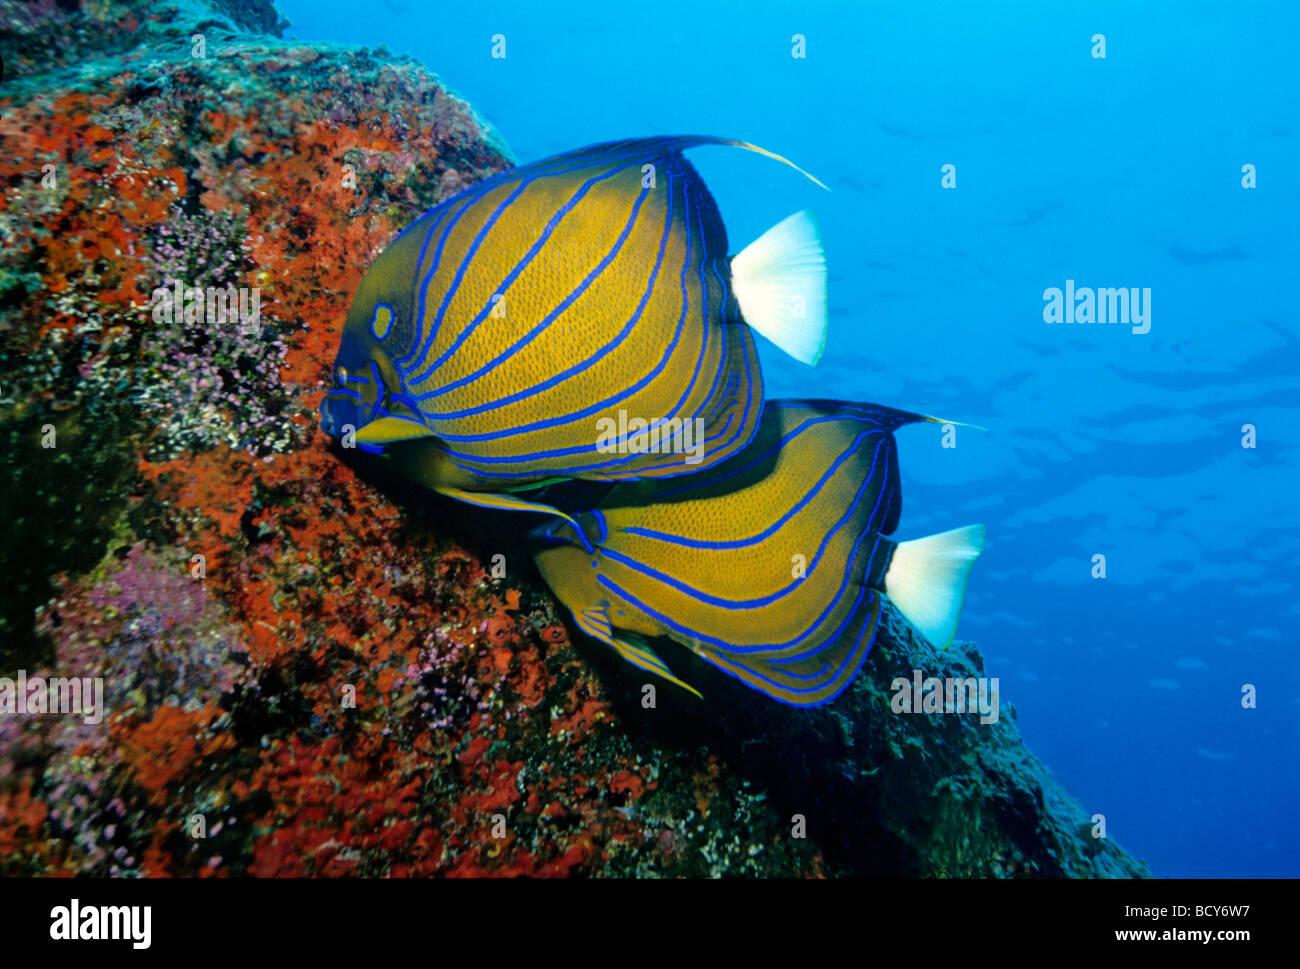 Bluering Angelfish (Pomacanthus annularis) eating red fungi, Similan Islands, Andaman Sea, Thailand, Asia, Indian - Stock Image